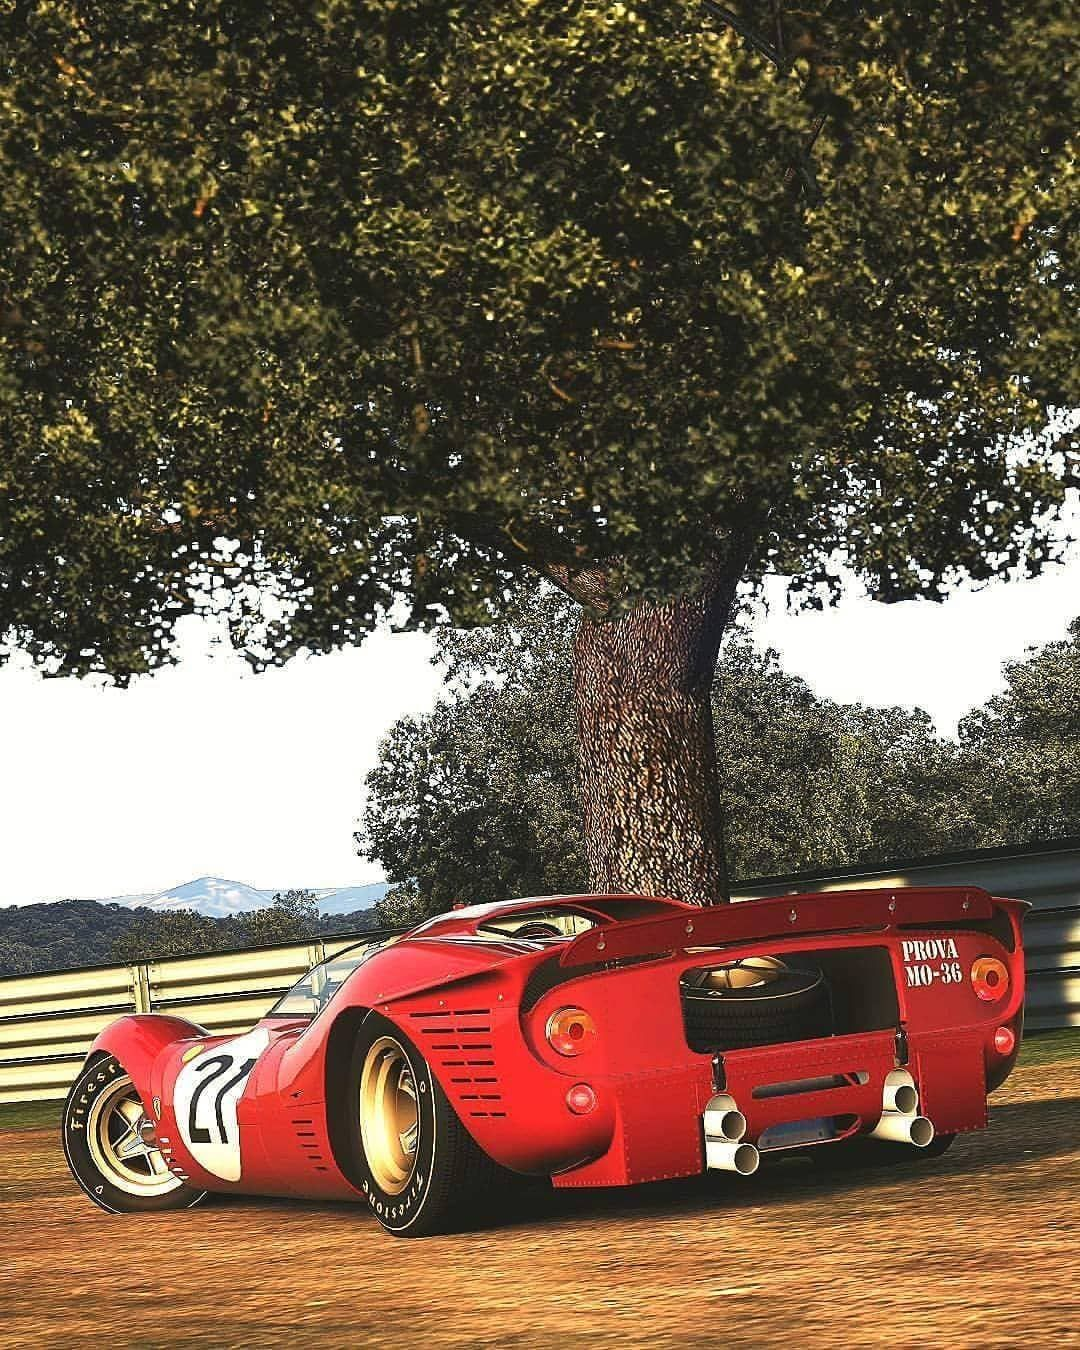 Pin By Dcroberts On Ferrari Ferrari Car Road Race Car Car Inspiration